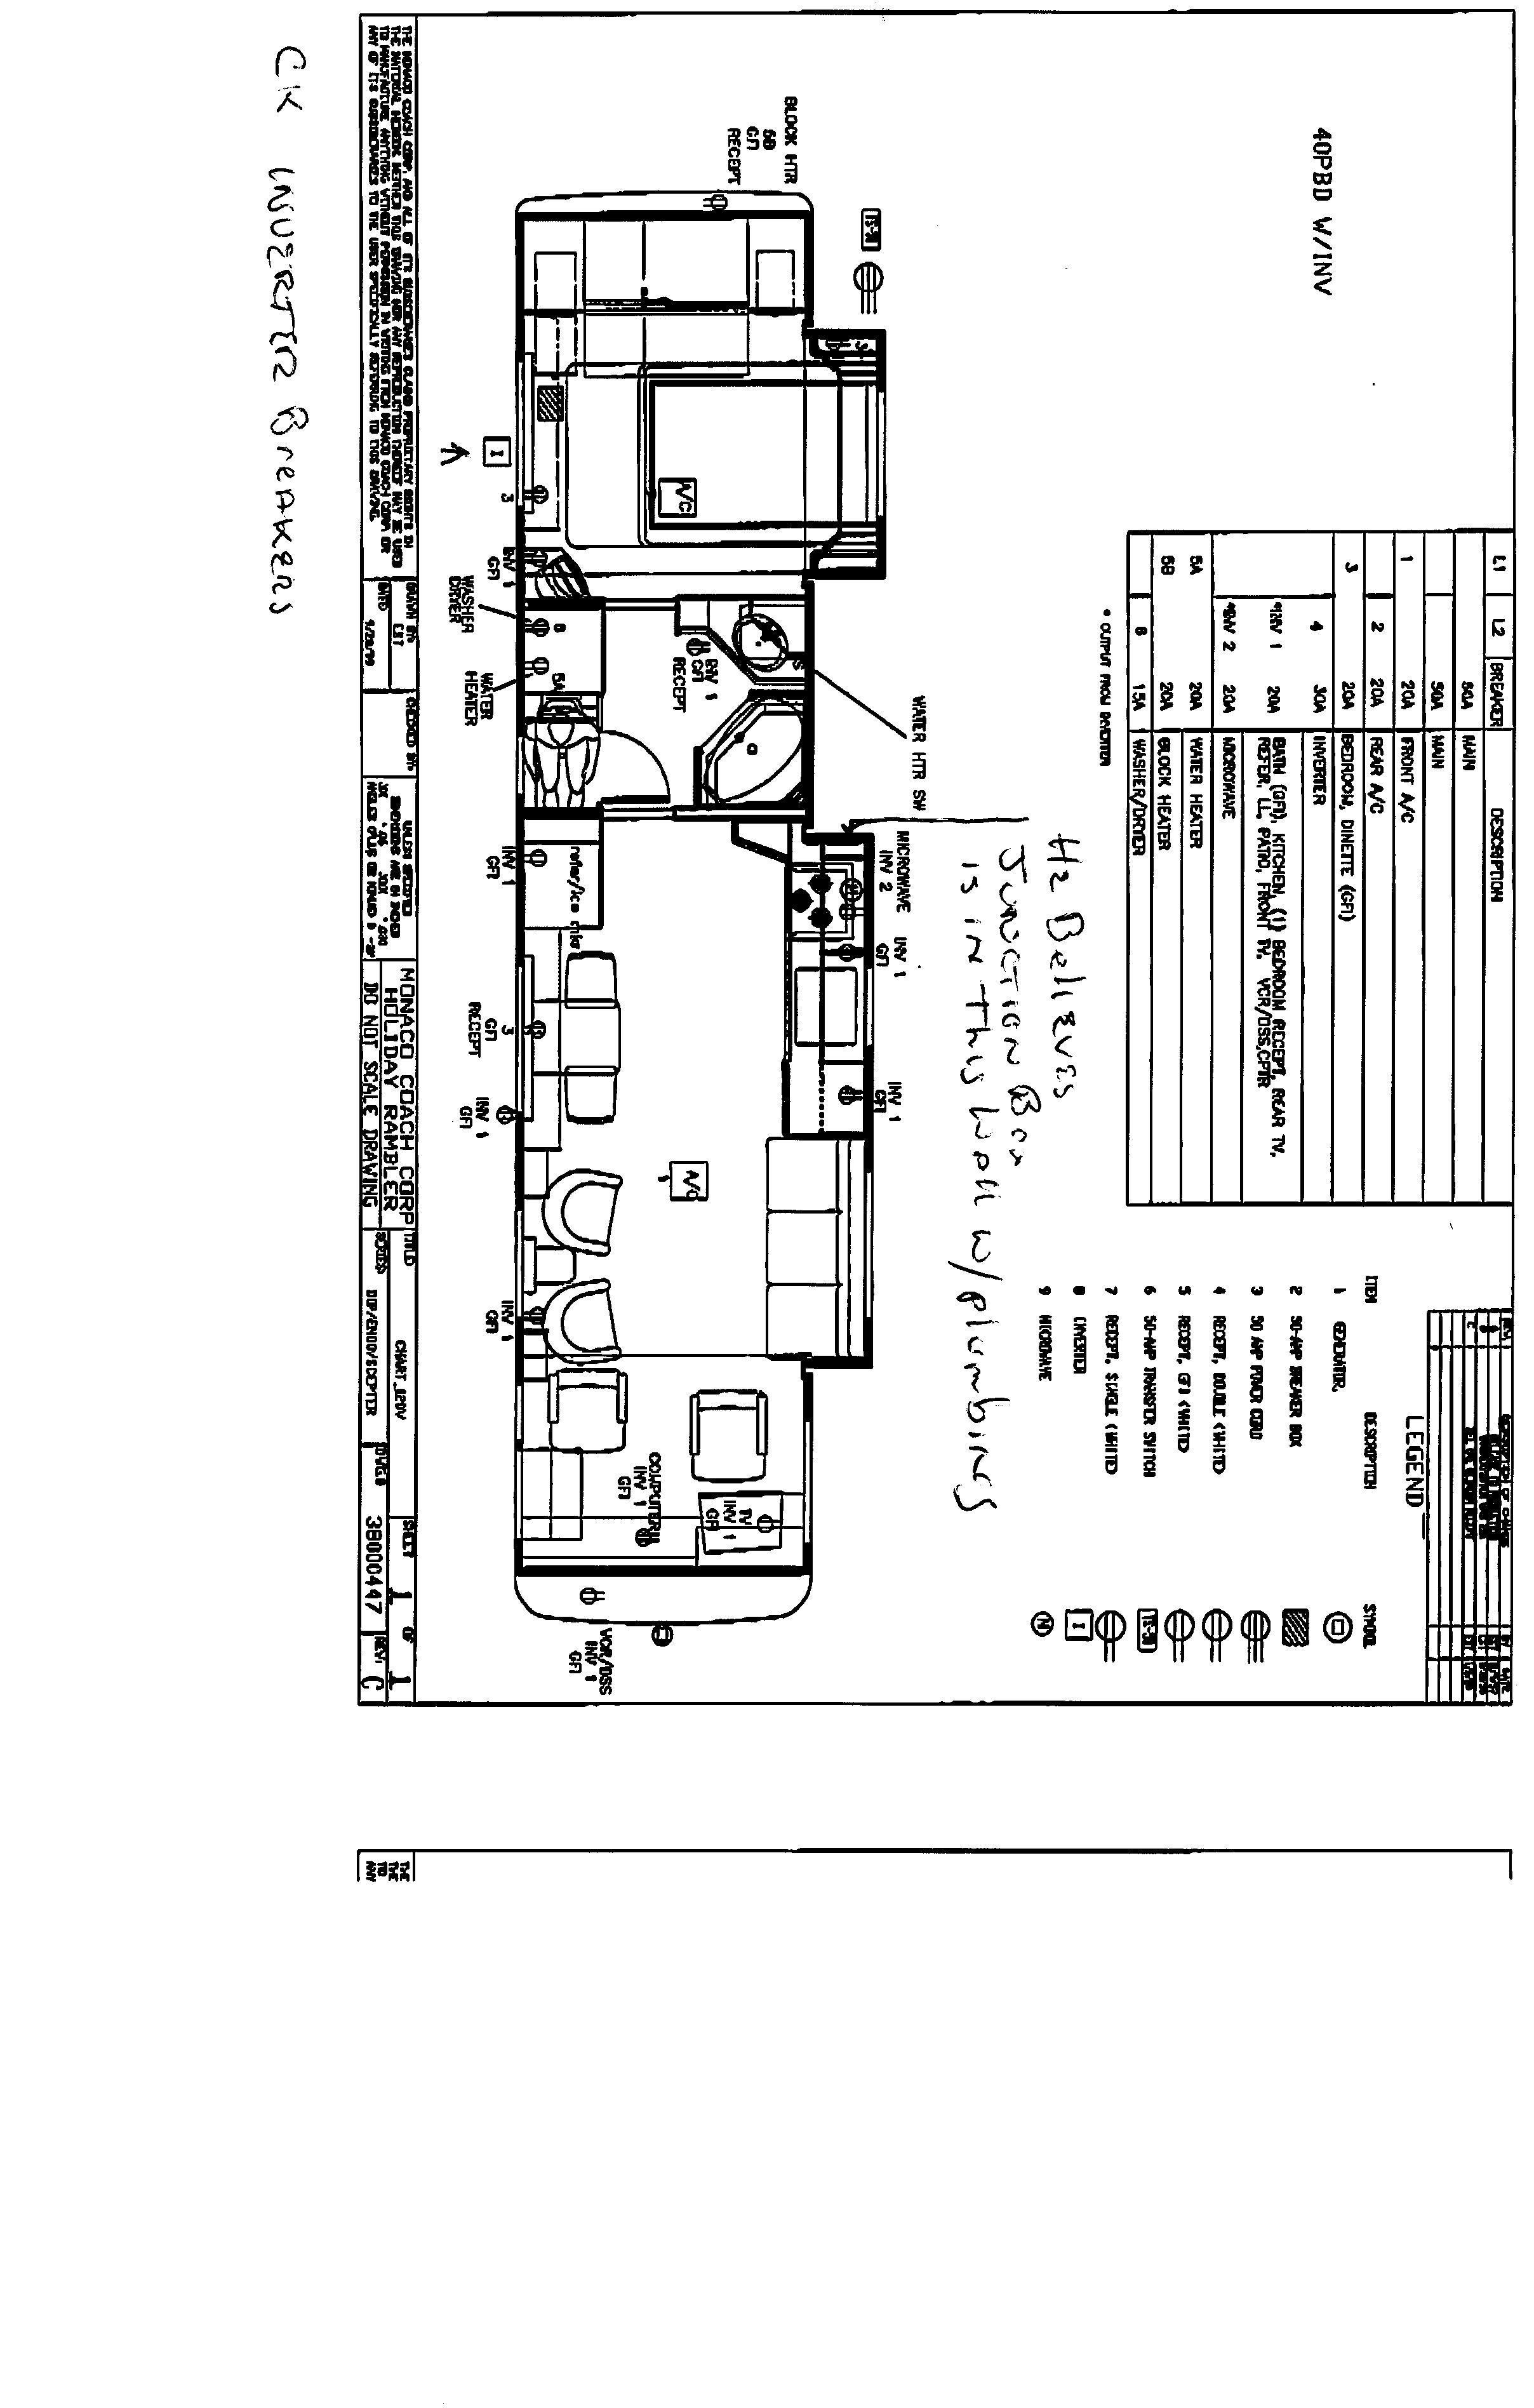 Wiring Diagrams Monaco Rv 2005 - Data Wiring Diagram Today - Monaco Rv Wiring Diagram